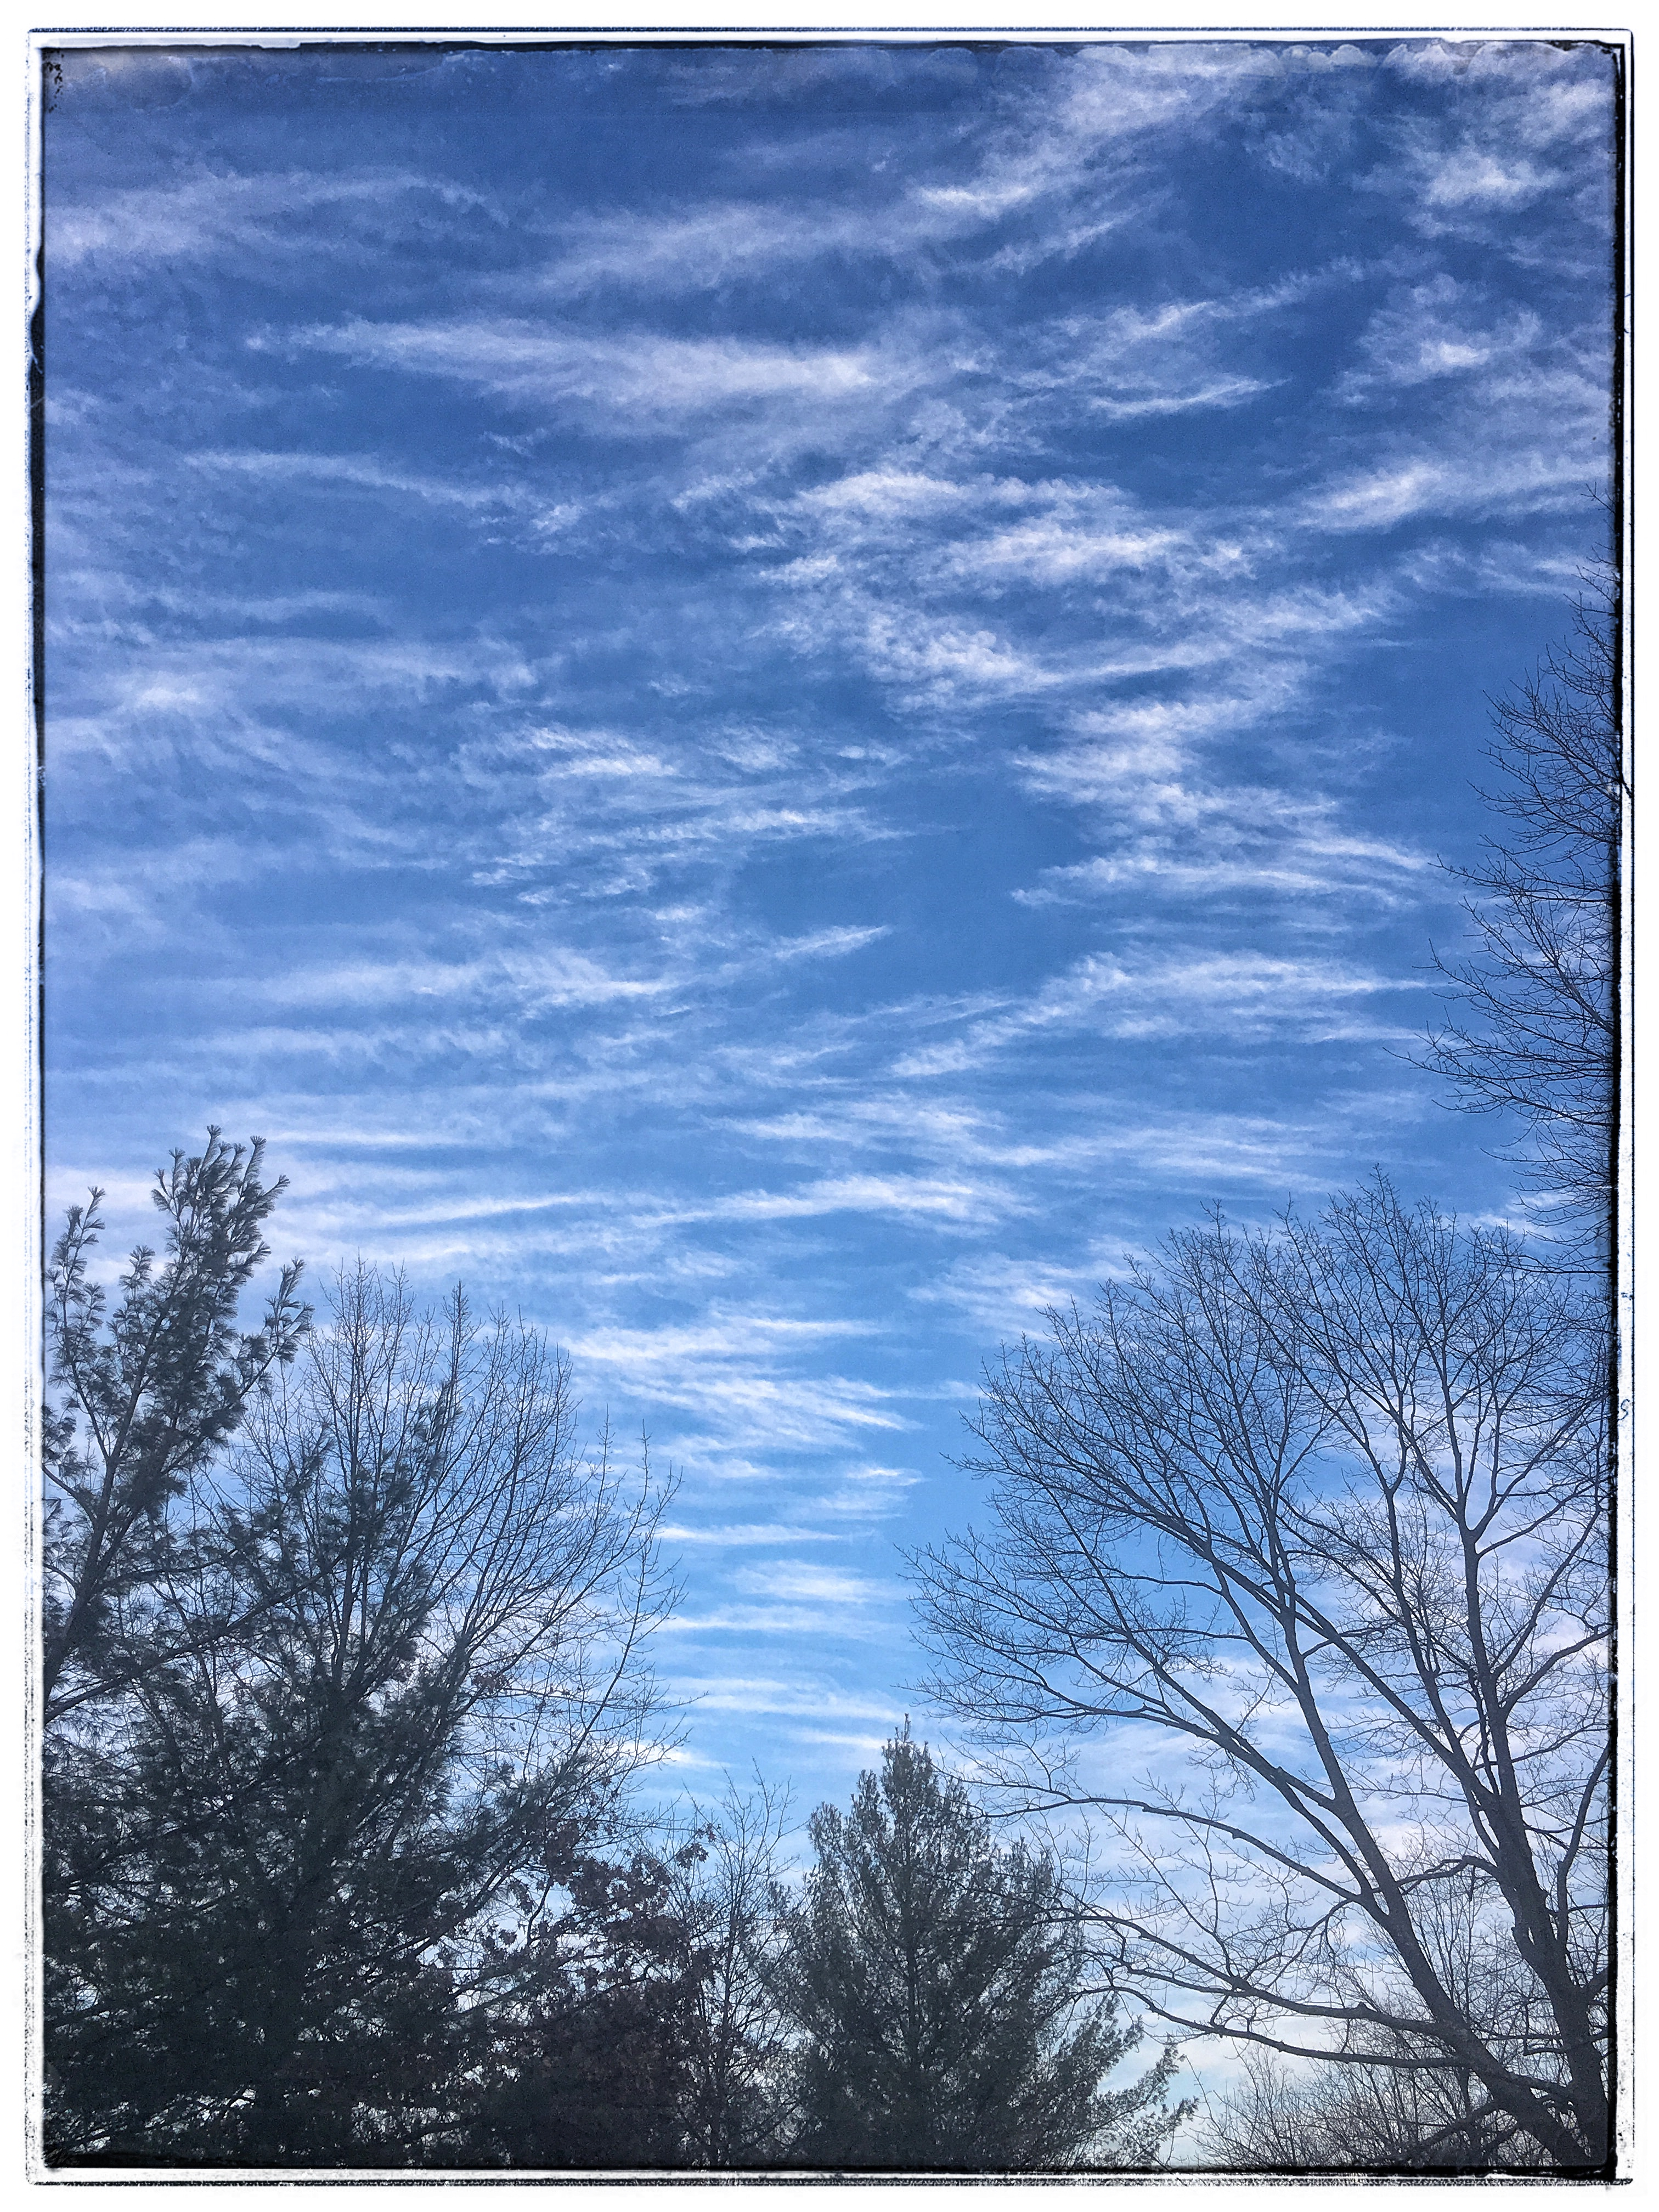 Runnymeade Clouds hirez.jpg